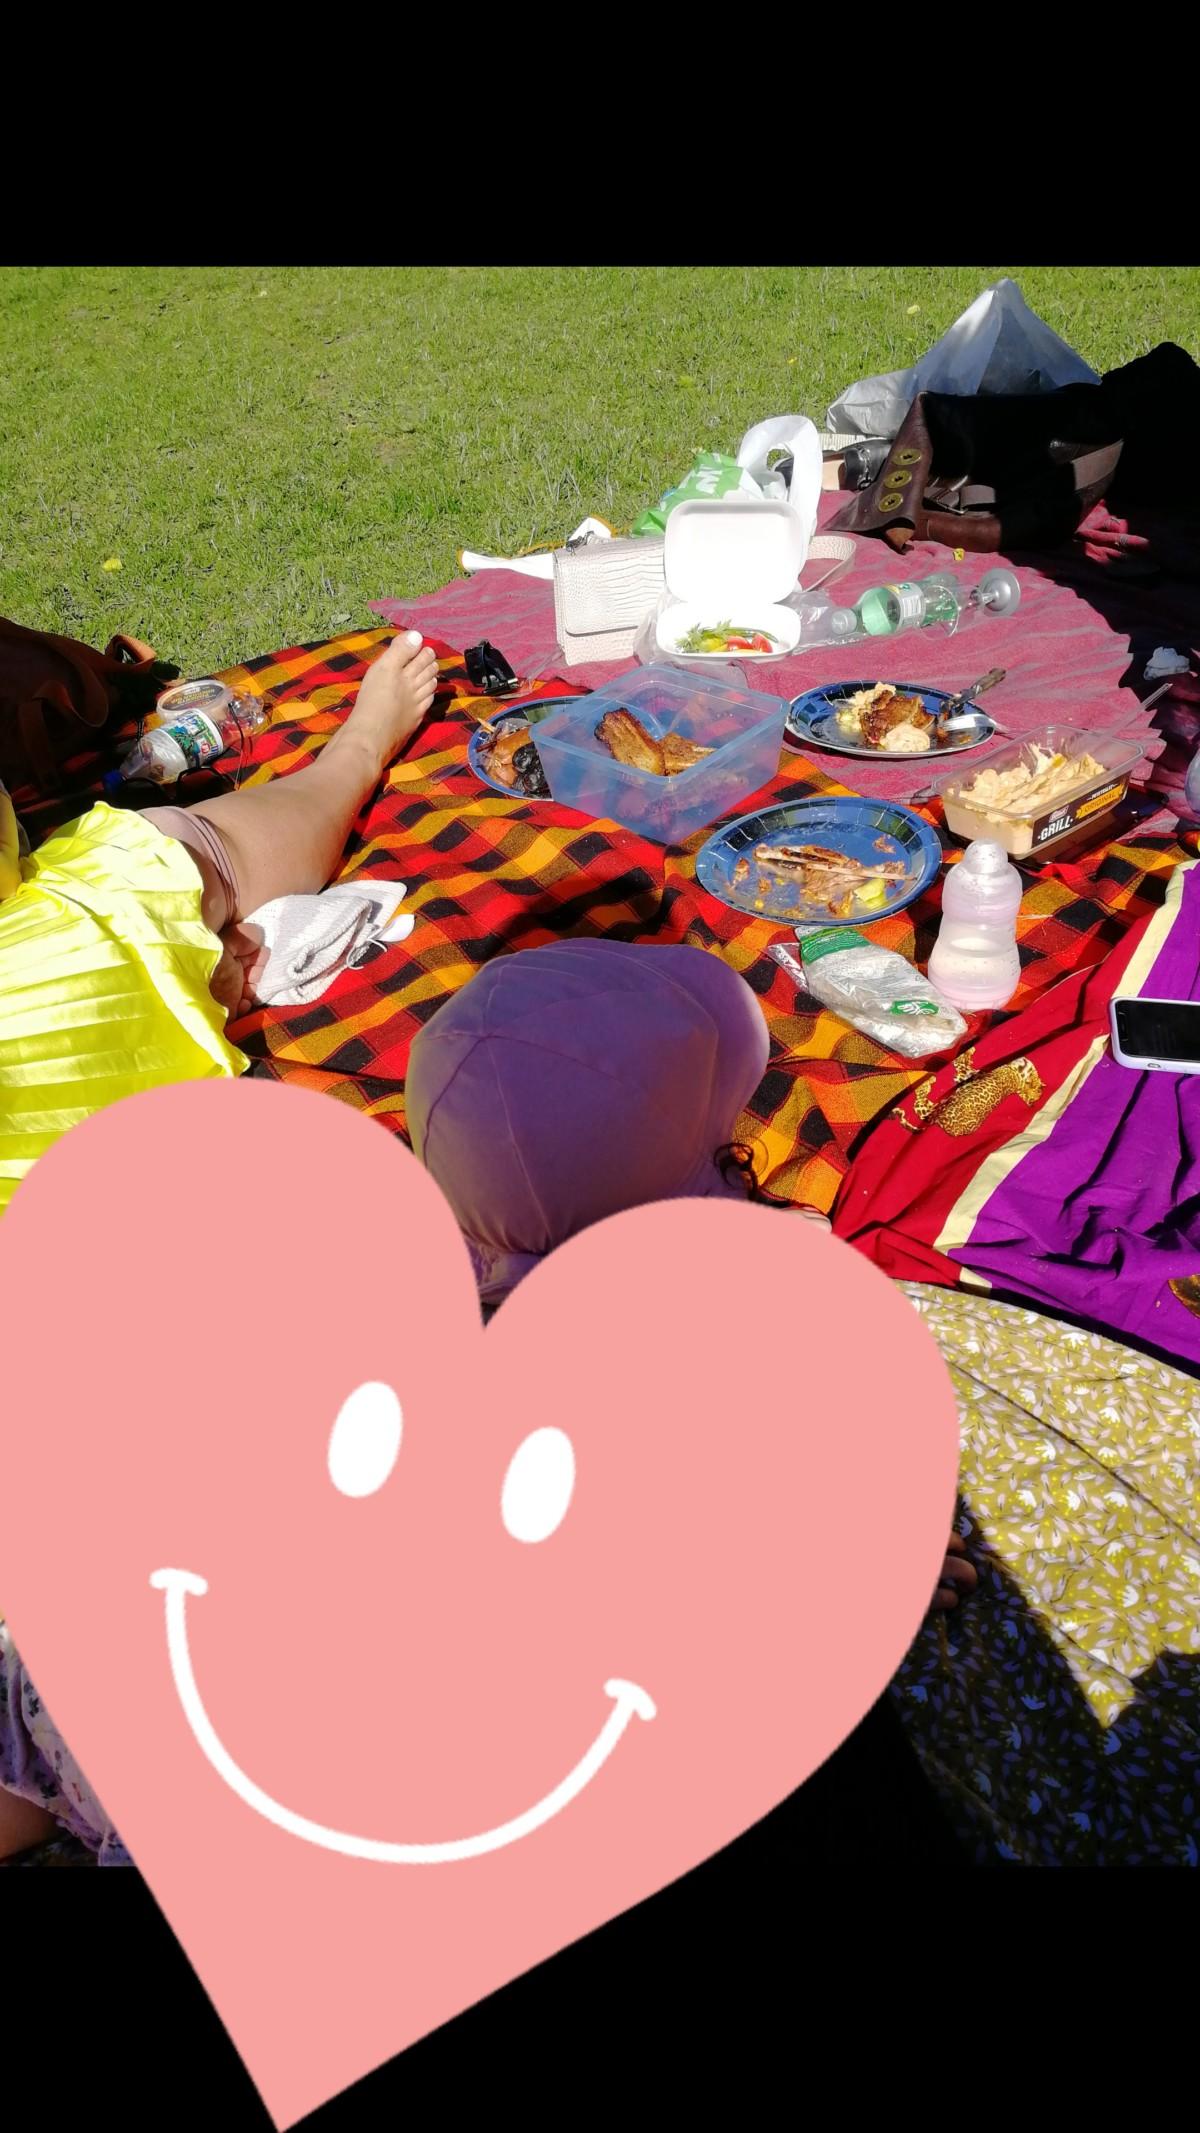 isalicious-blogger-bloggno-blogging-outfit-antrekk-stil-mote-oslo-diplomis-royal-trippelroyal-muffins-baking-marrokansk-mat-middag-burgerking-milkshake-baking-spacex-iskrem-is-sminke-park